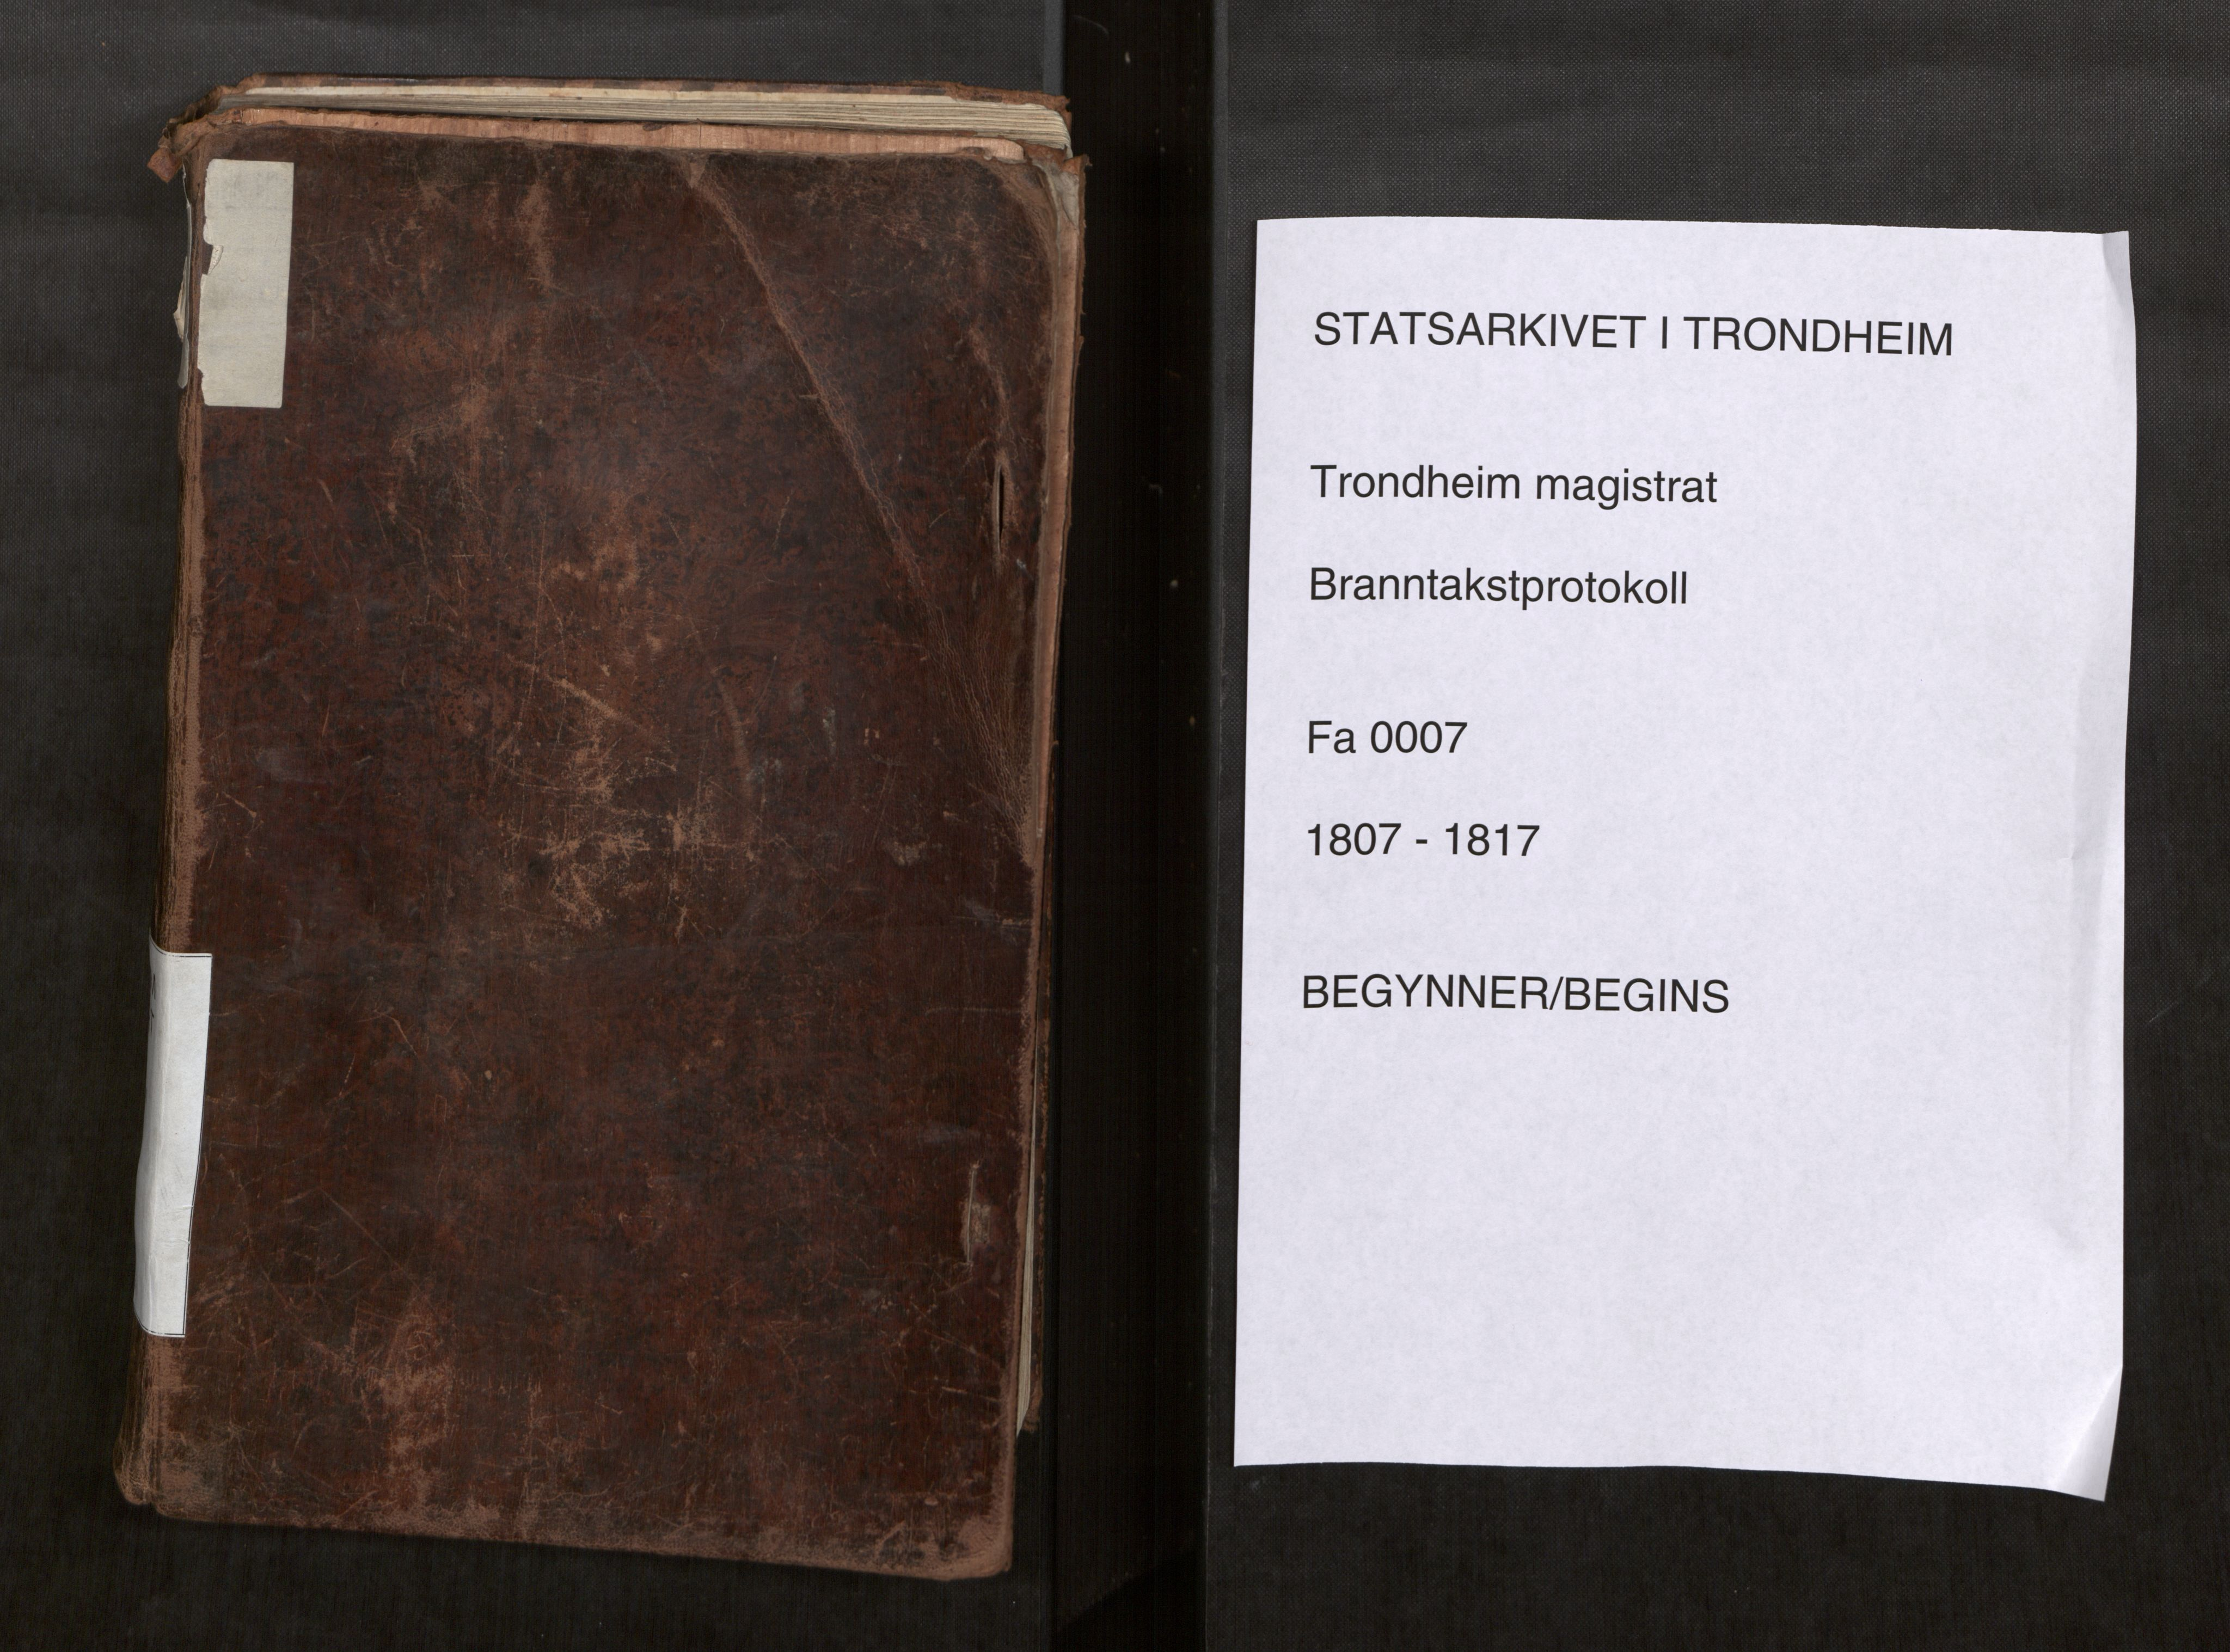 SAT, Norges Brannkasse Trondheim magistrat, Fa/L0009: Branntakstprotokoll K11, 1807-1817